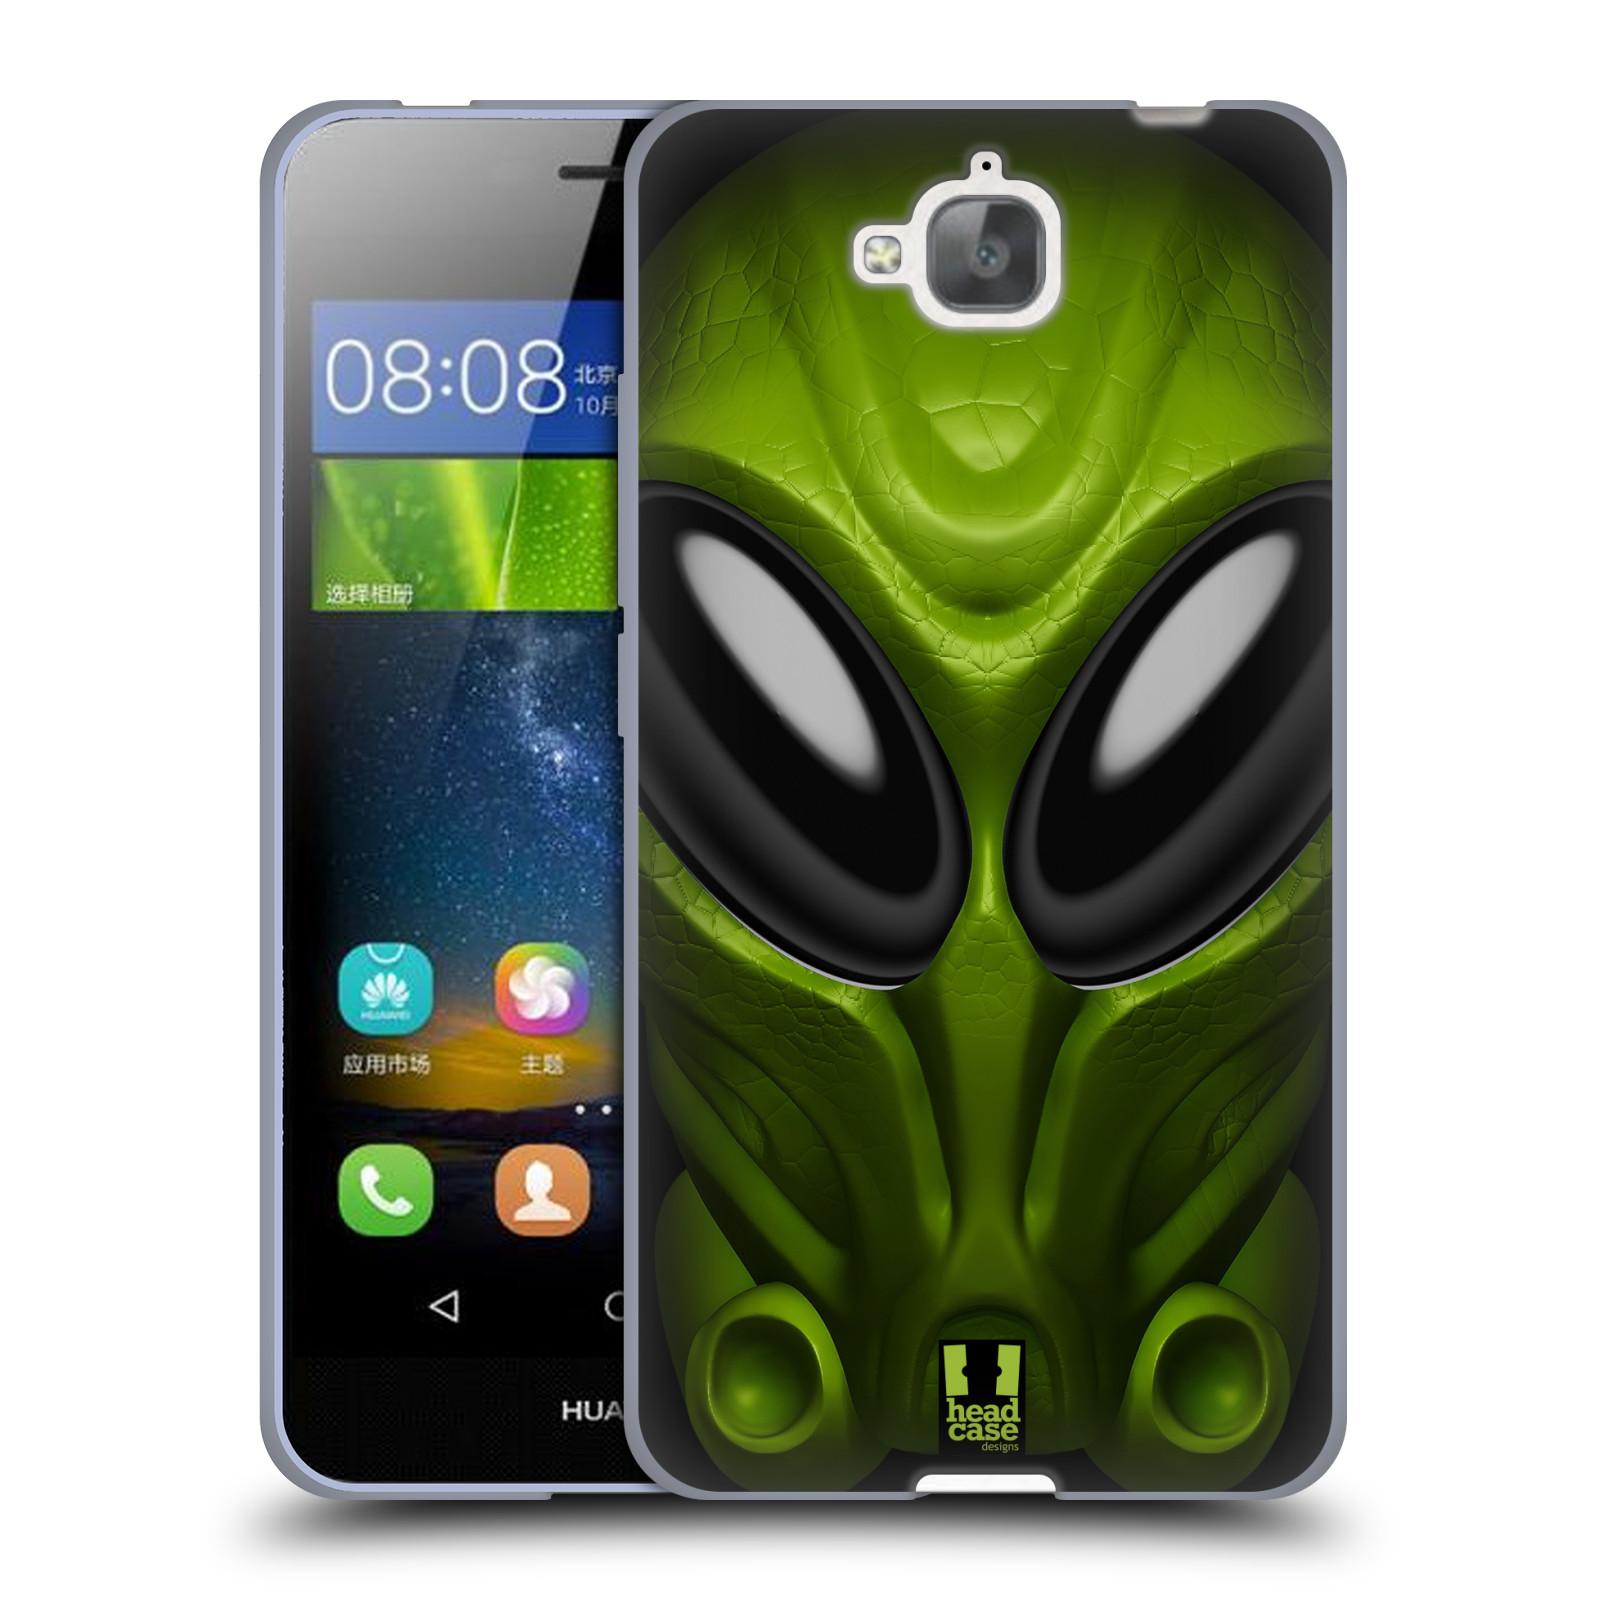 Silikonové pouzdro na mobil Huawei Y6 Pro Dual Sim - Head Case - Ufoun Mastermind